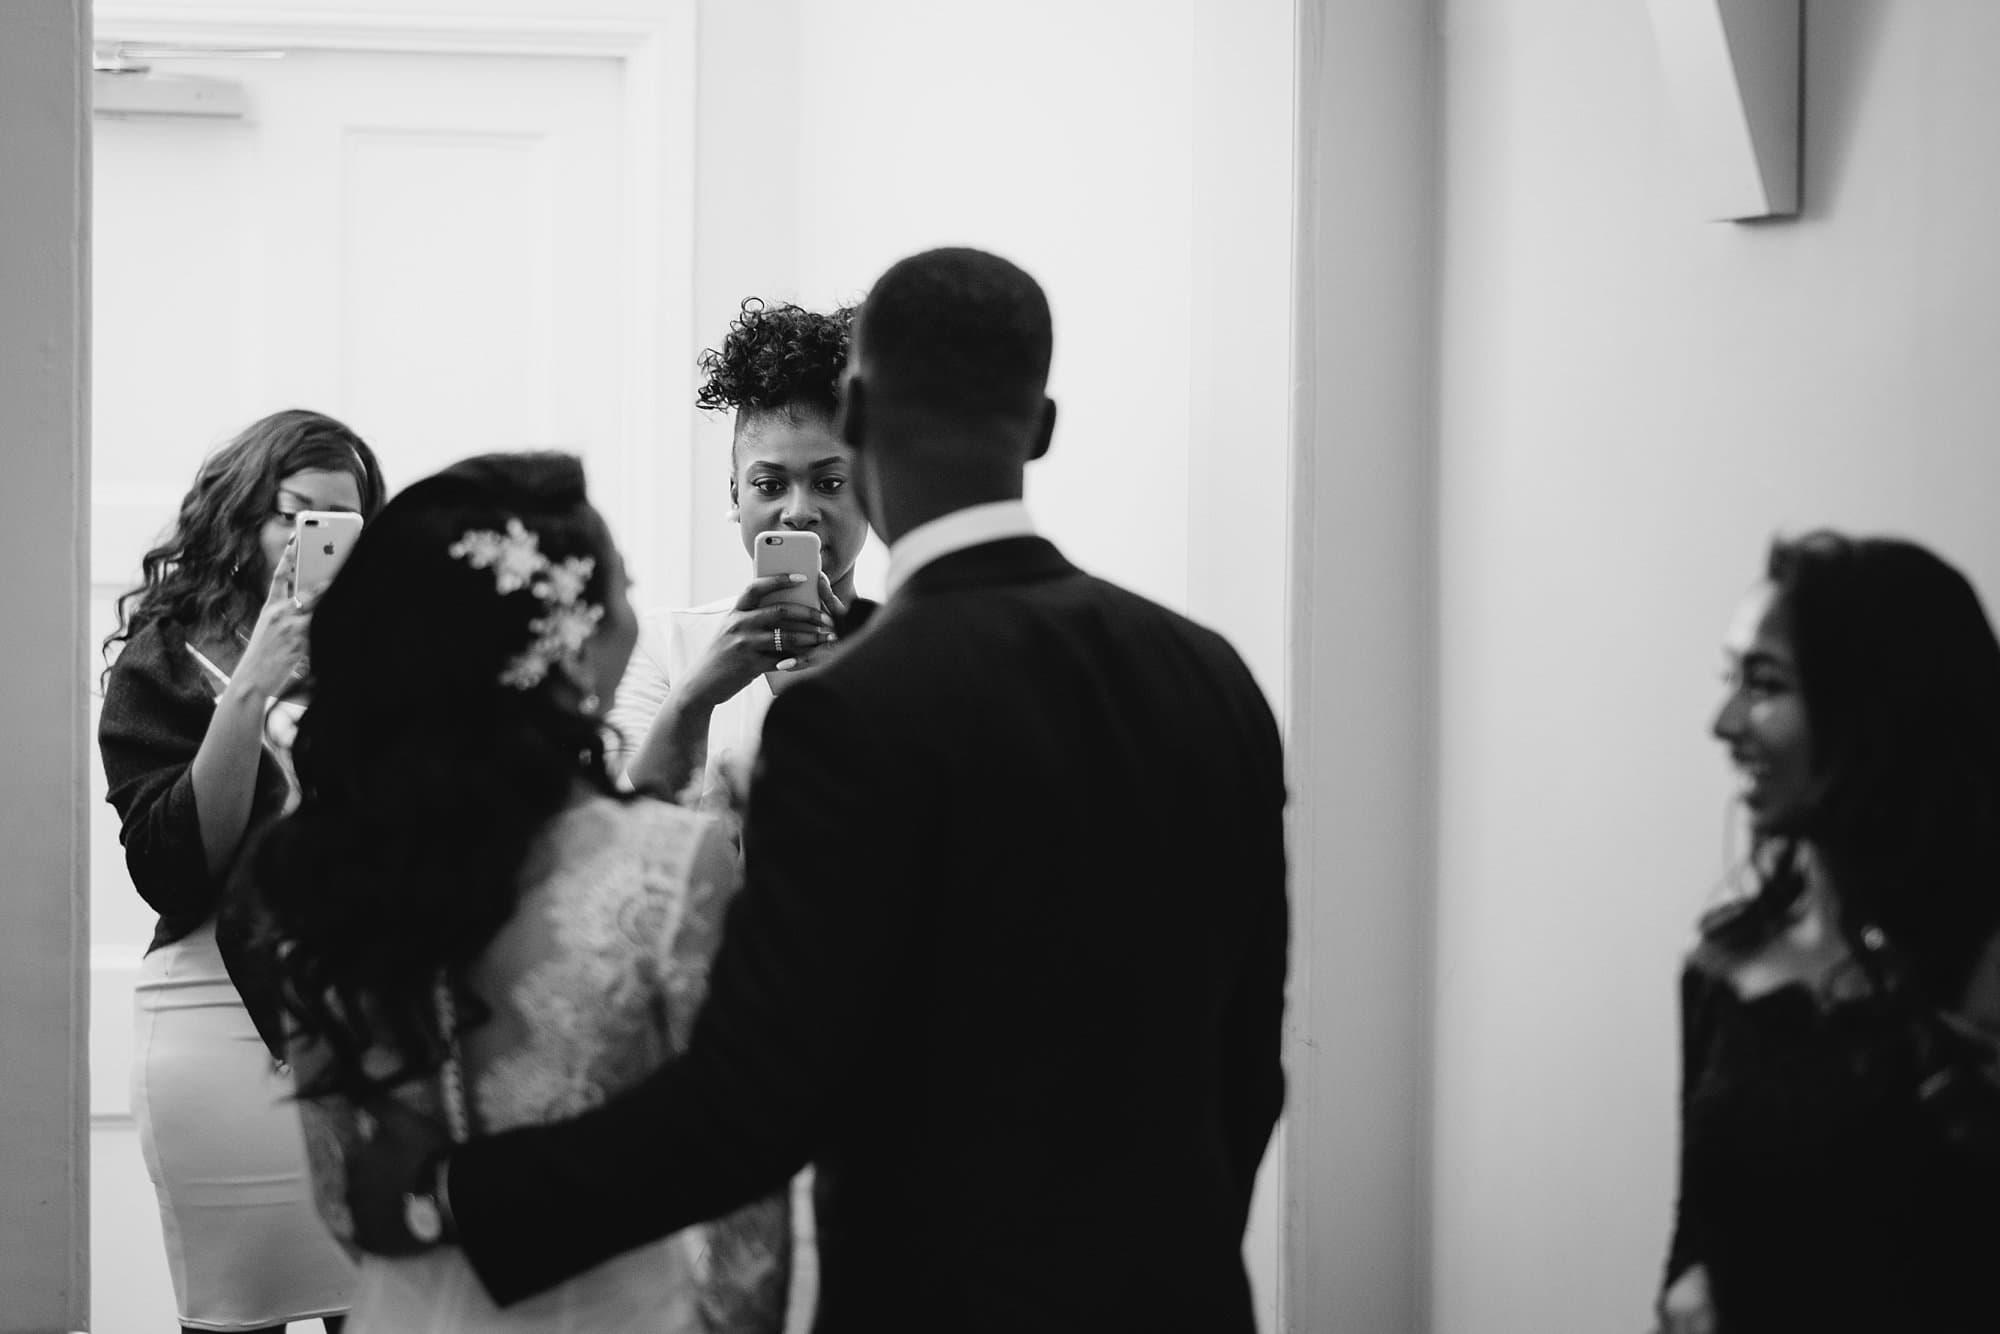 asia house london wedding photographer 014 - Rachel + Gabriel   Asia House Wedding Photography